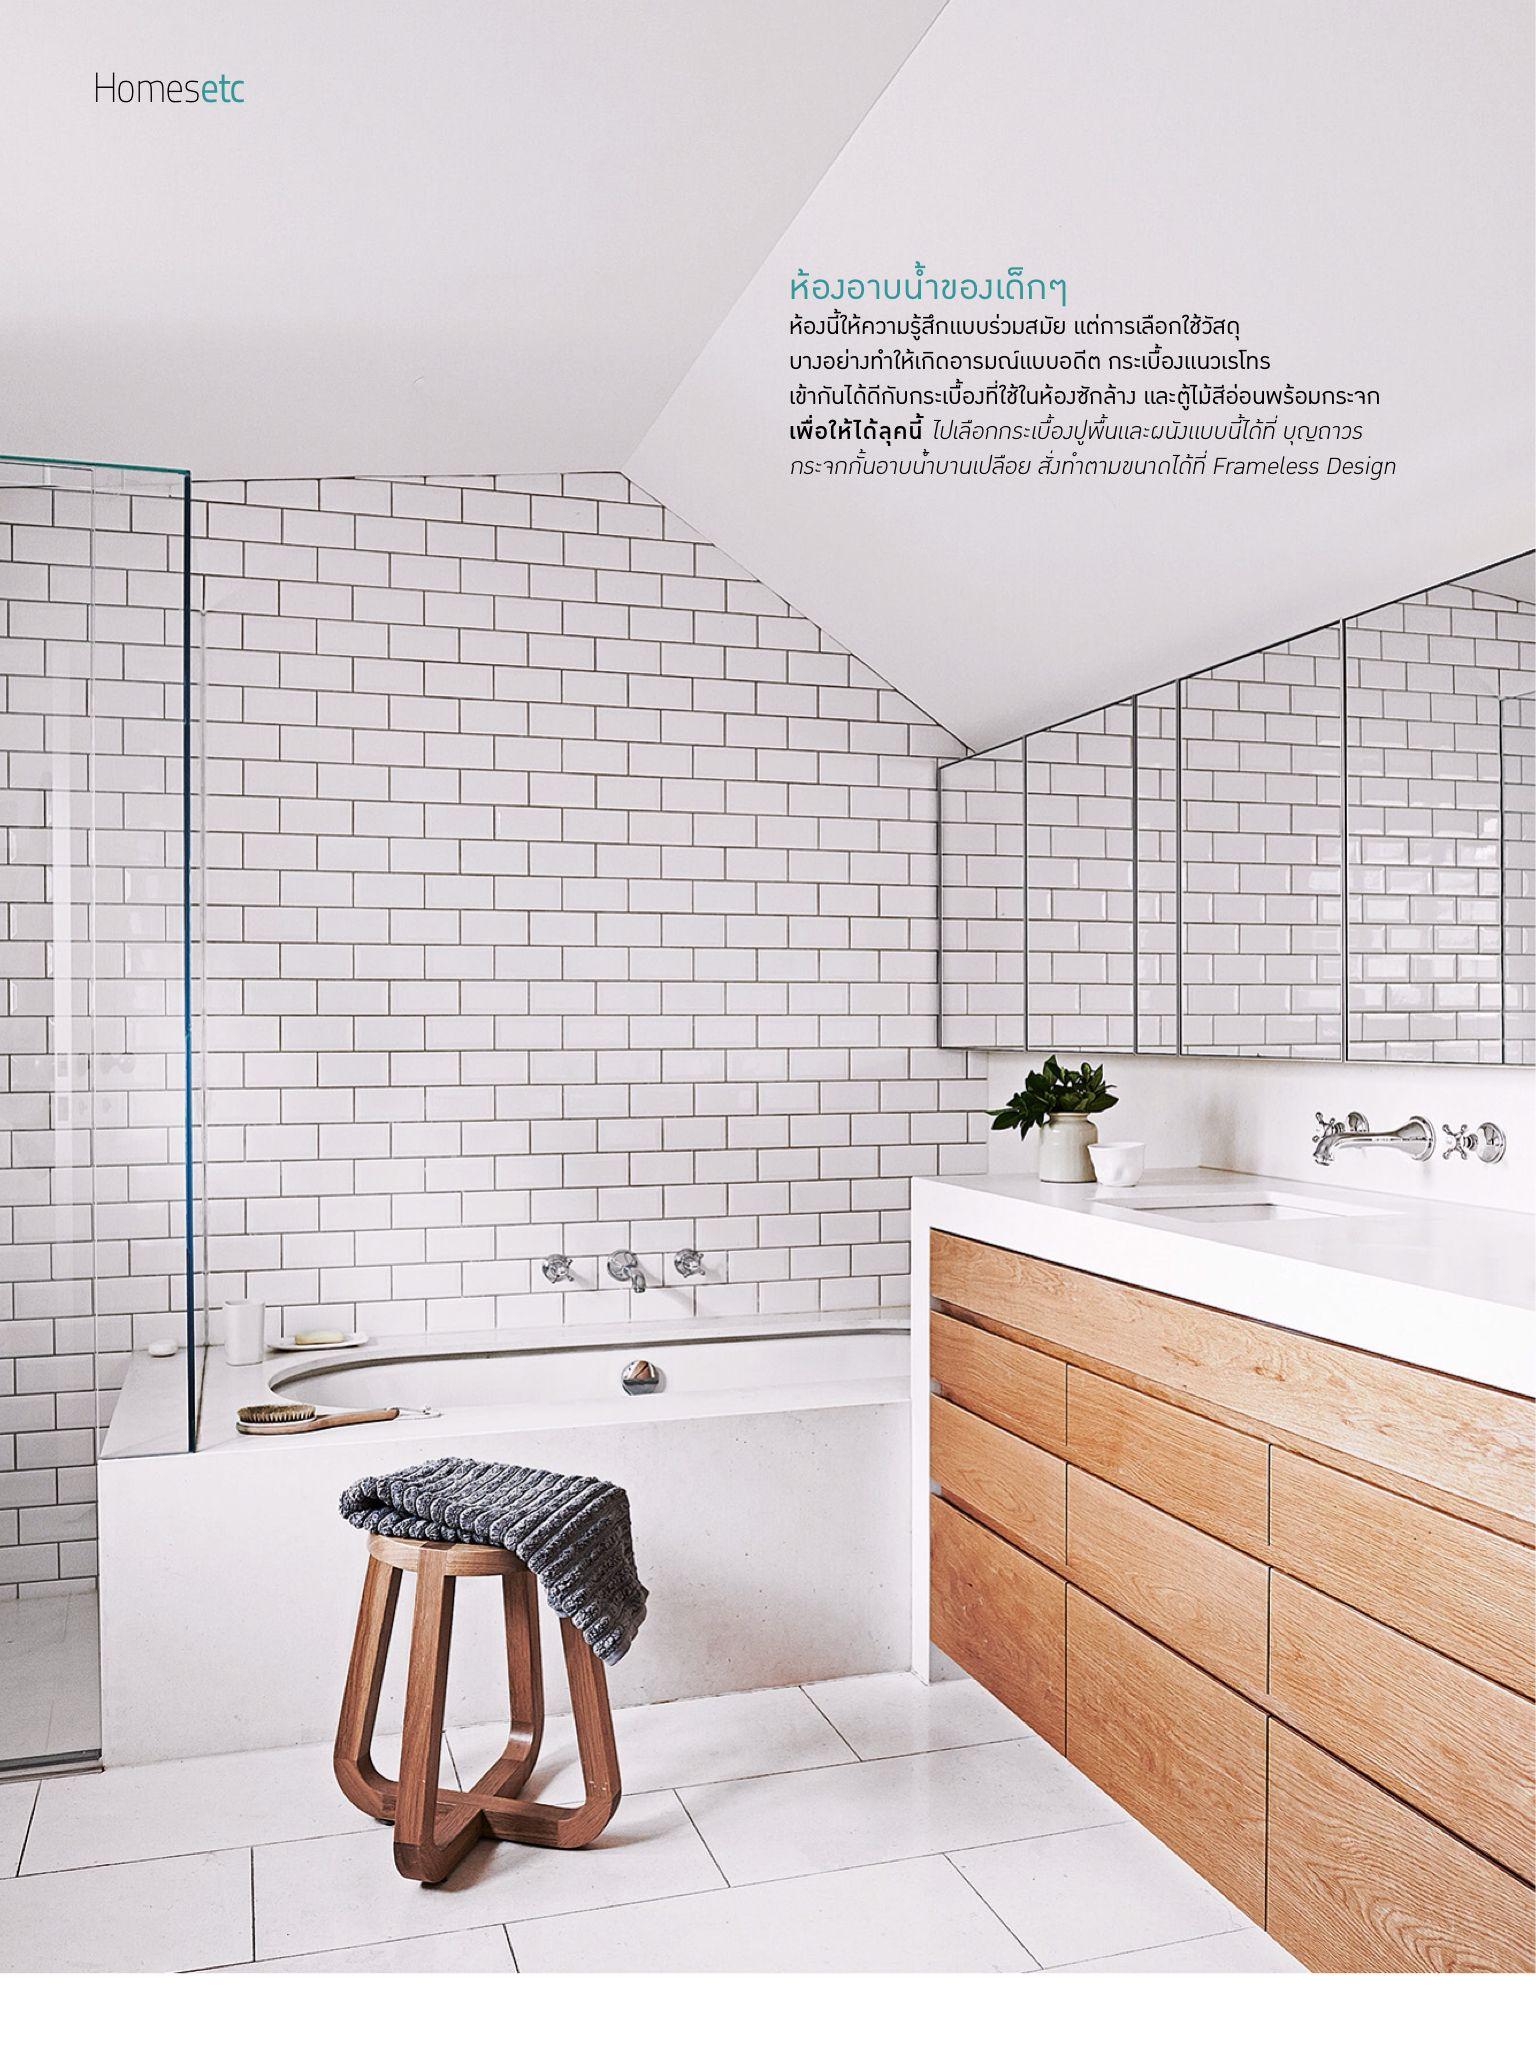 Badezimmer design hd-bilder pin by puyu prayrin chongsringam on badezimmer  pinterest  tile